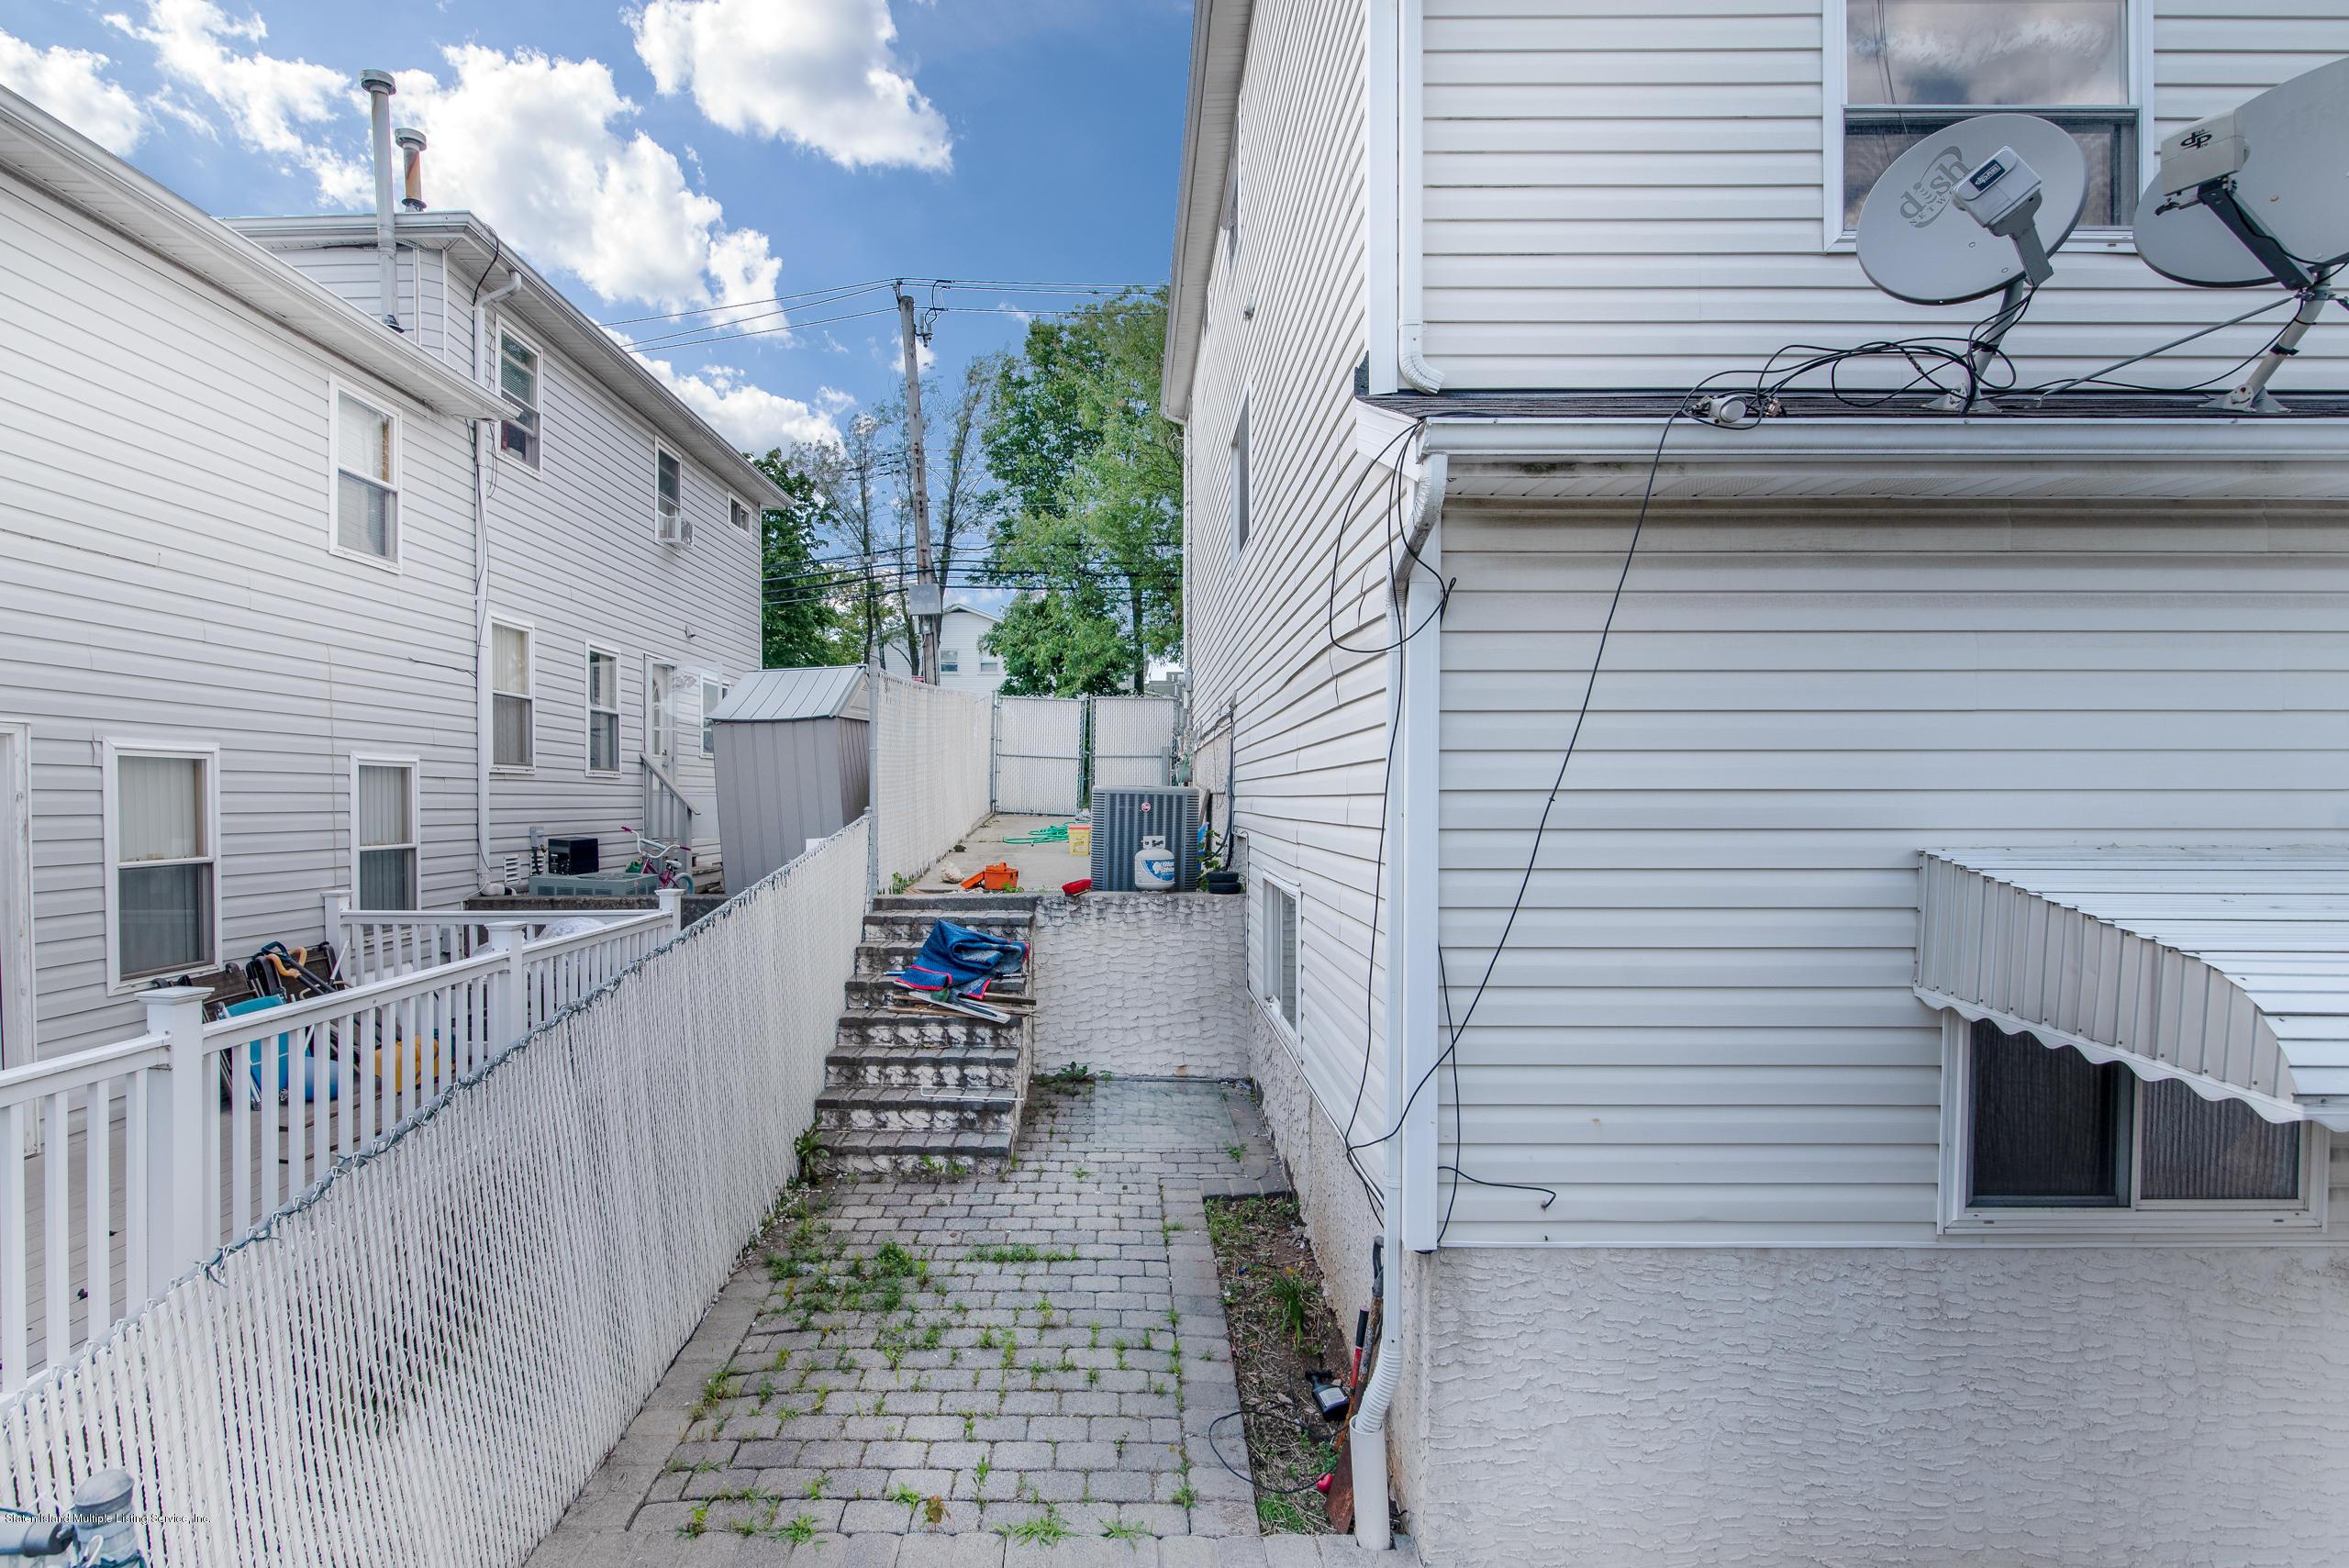 Single Family - Semi-Attached 230 Holden Boulevard  Staten Island, NY 10314, MLS-1130208-20